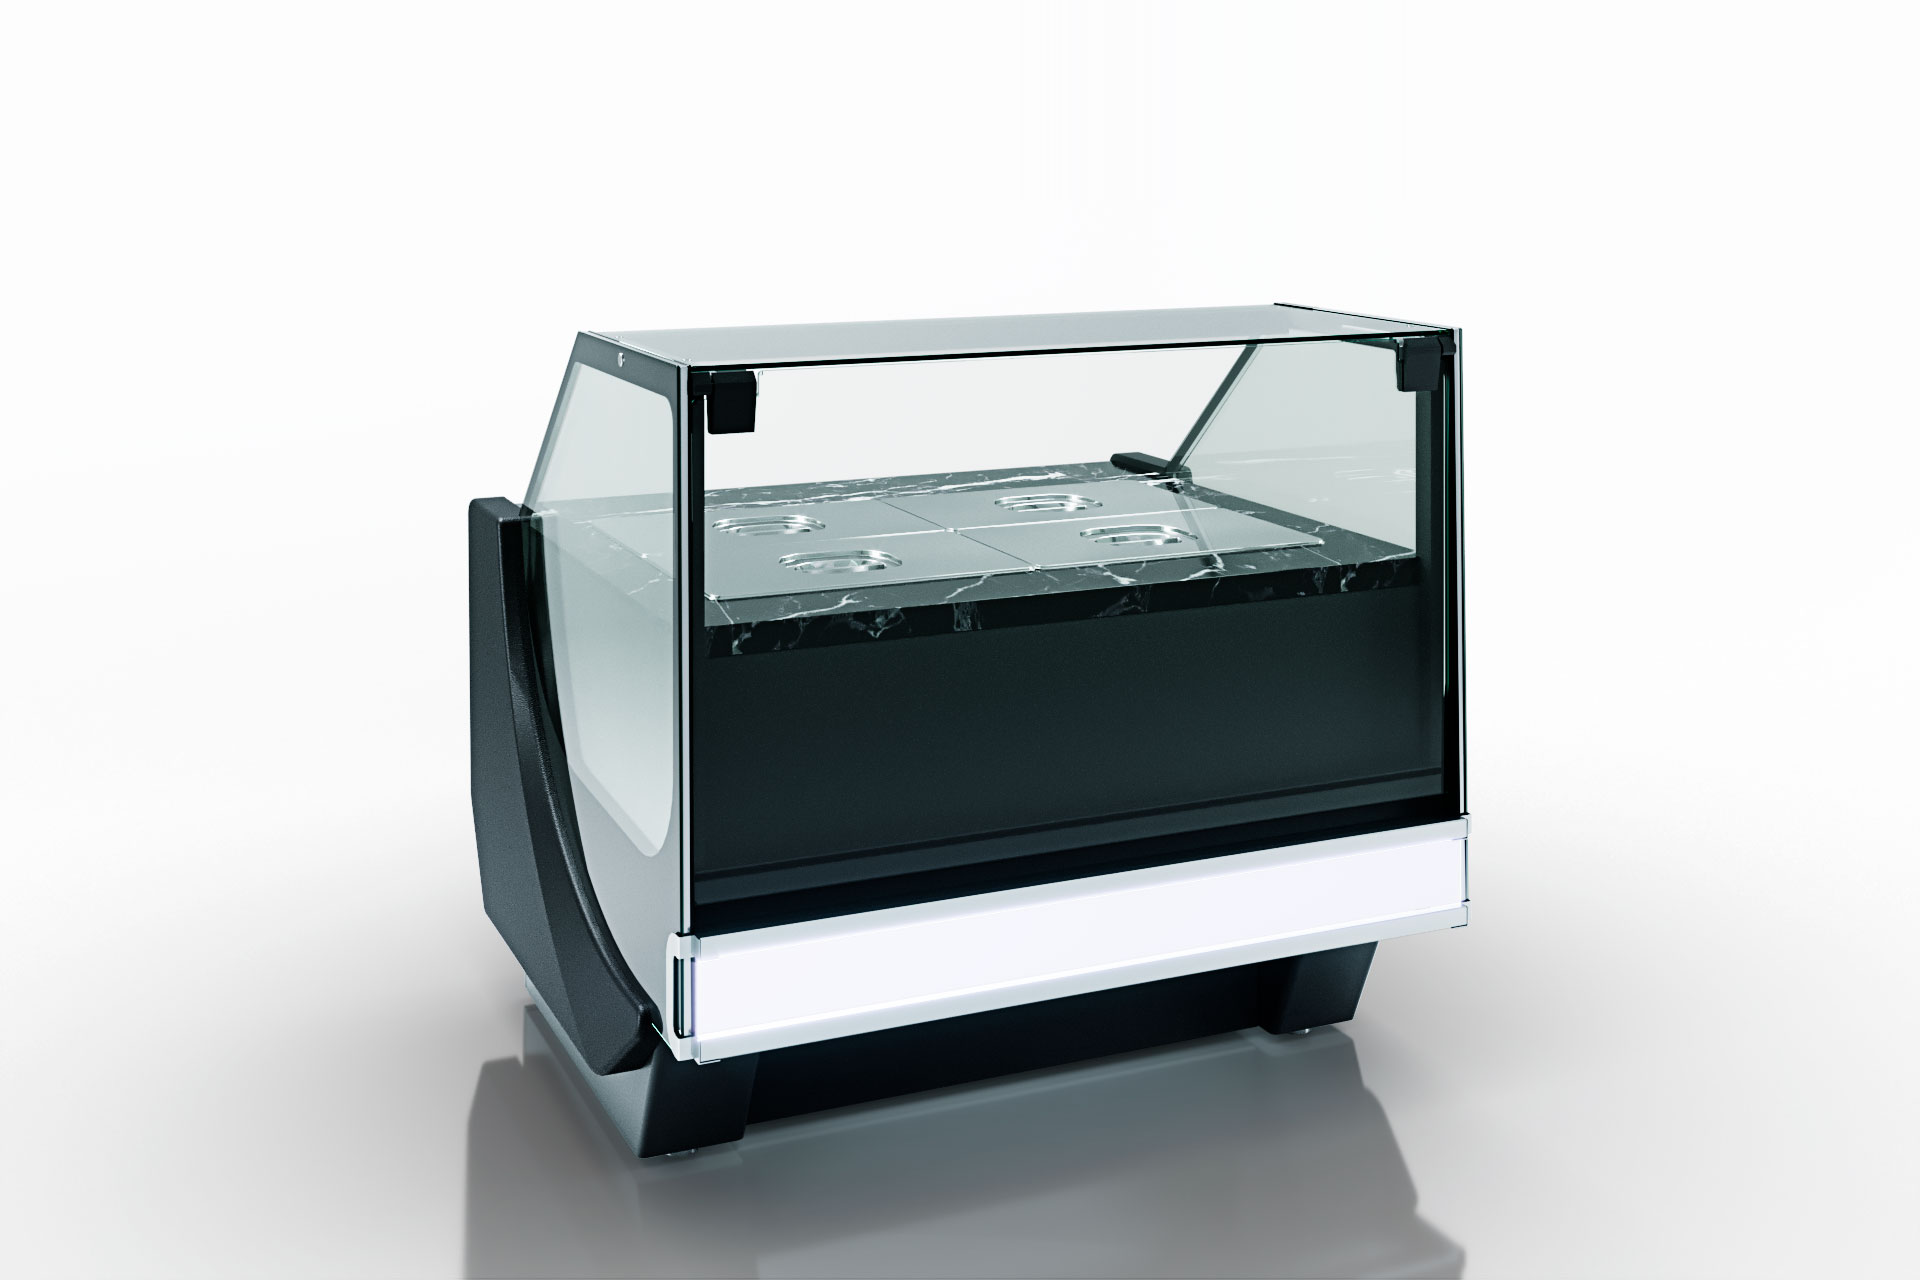 Missouri cold diamond MC 115 pickles PS 121-SLM